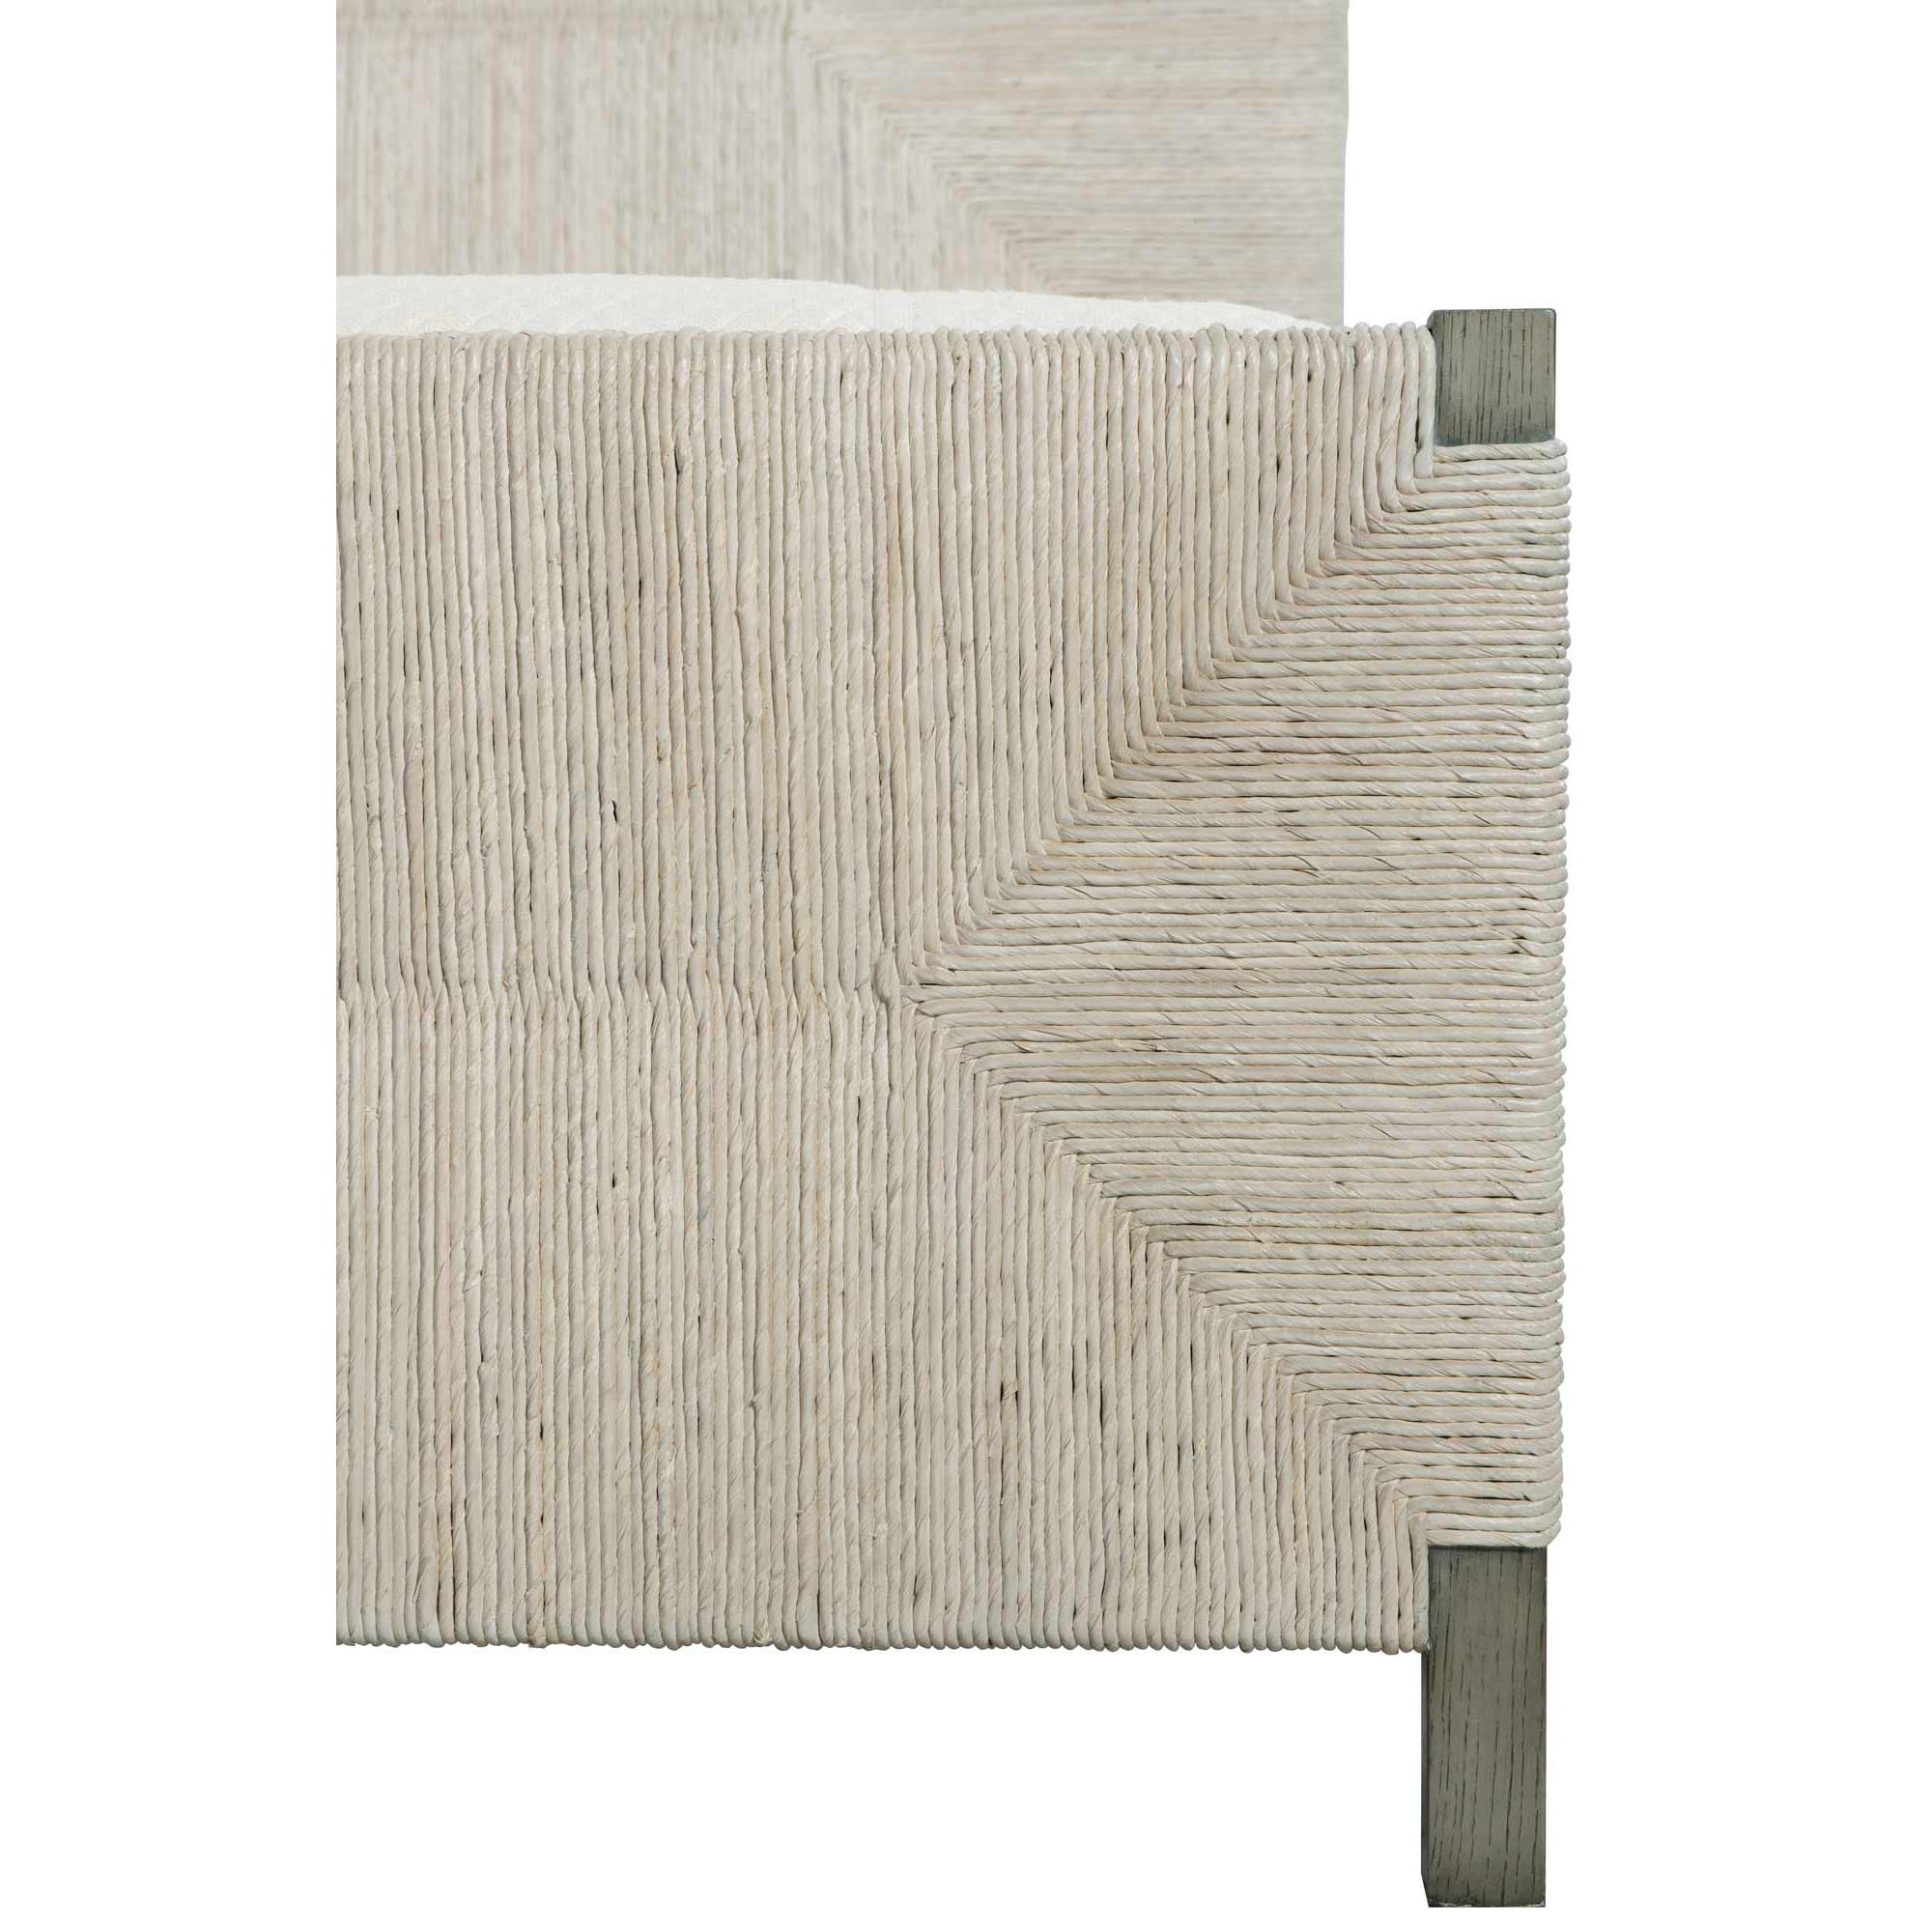 Vivian Coastal Beach Light Grey Woven Abaca Grey Wood Bed - King